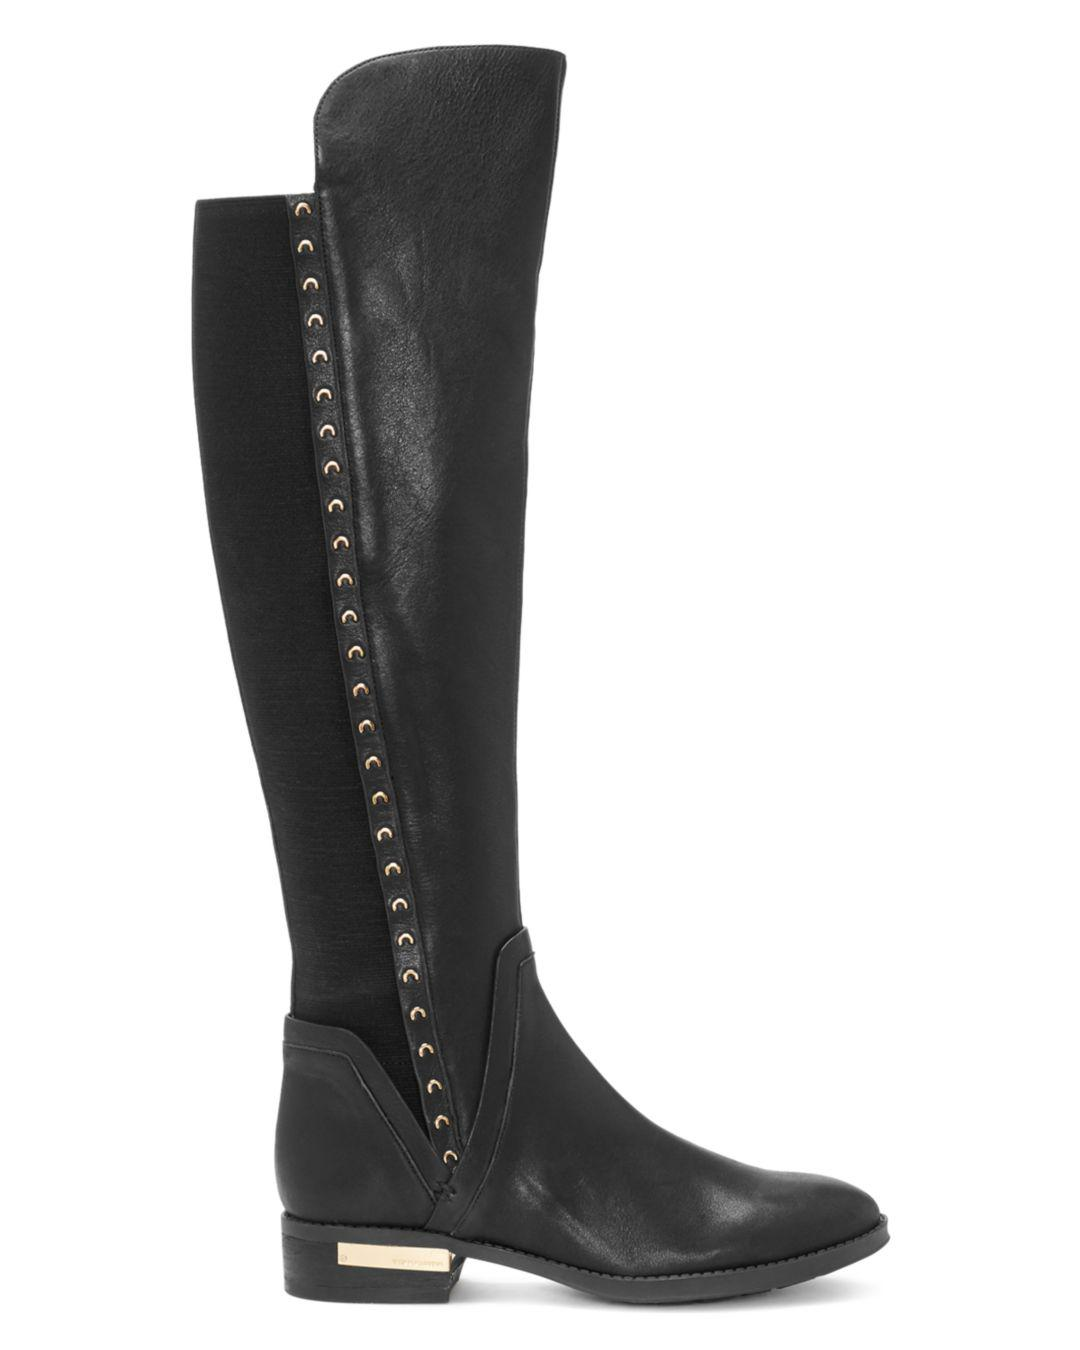 0443fc52c68 Vince Camuto Black Women's Pardonal Studded Leather Riding Boots